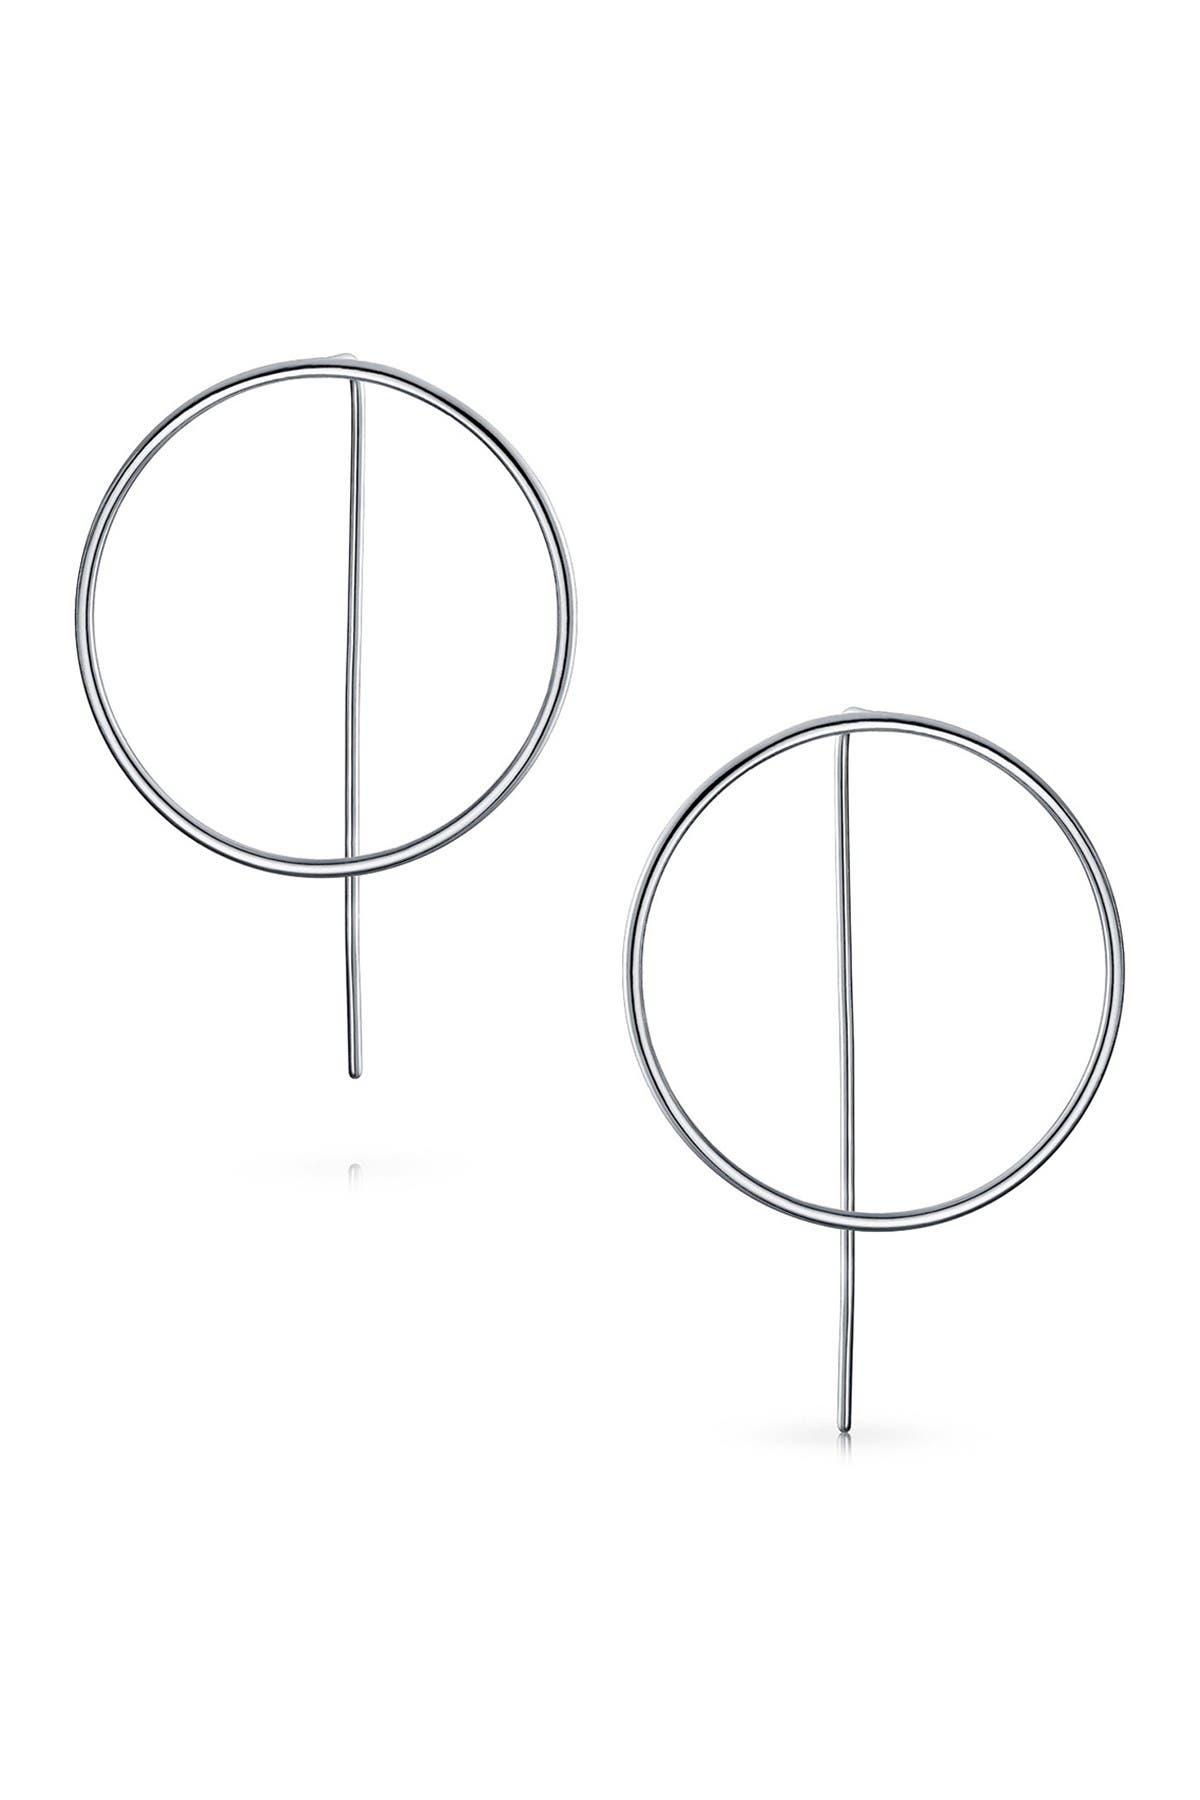 Image of Bling Jewelry Sterling Silver Front Facing Modern Hoop Drop Earrings